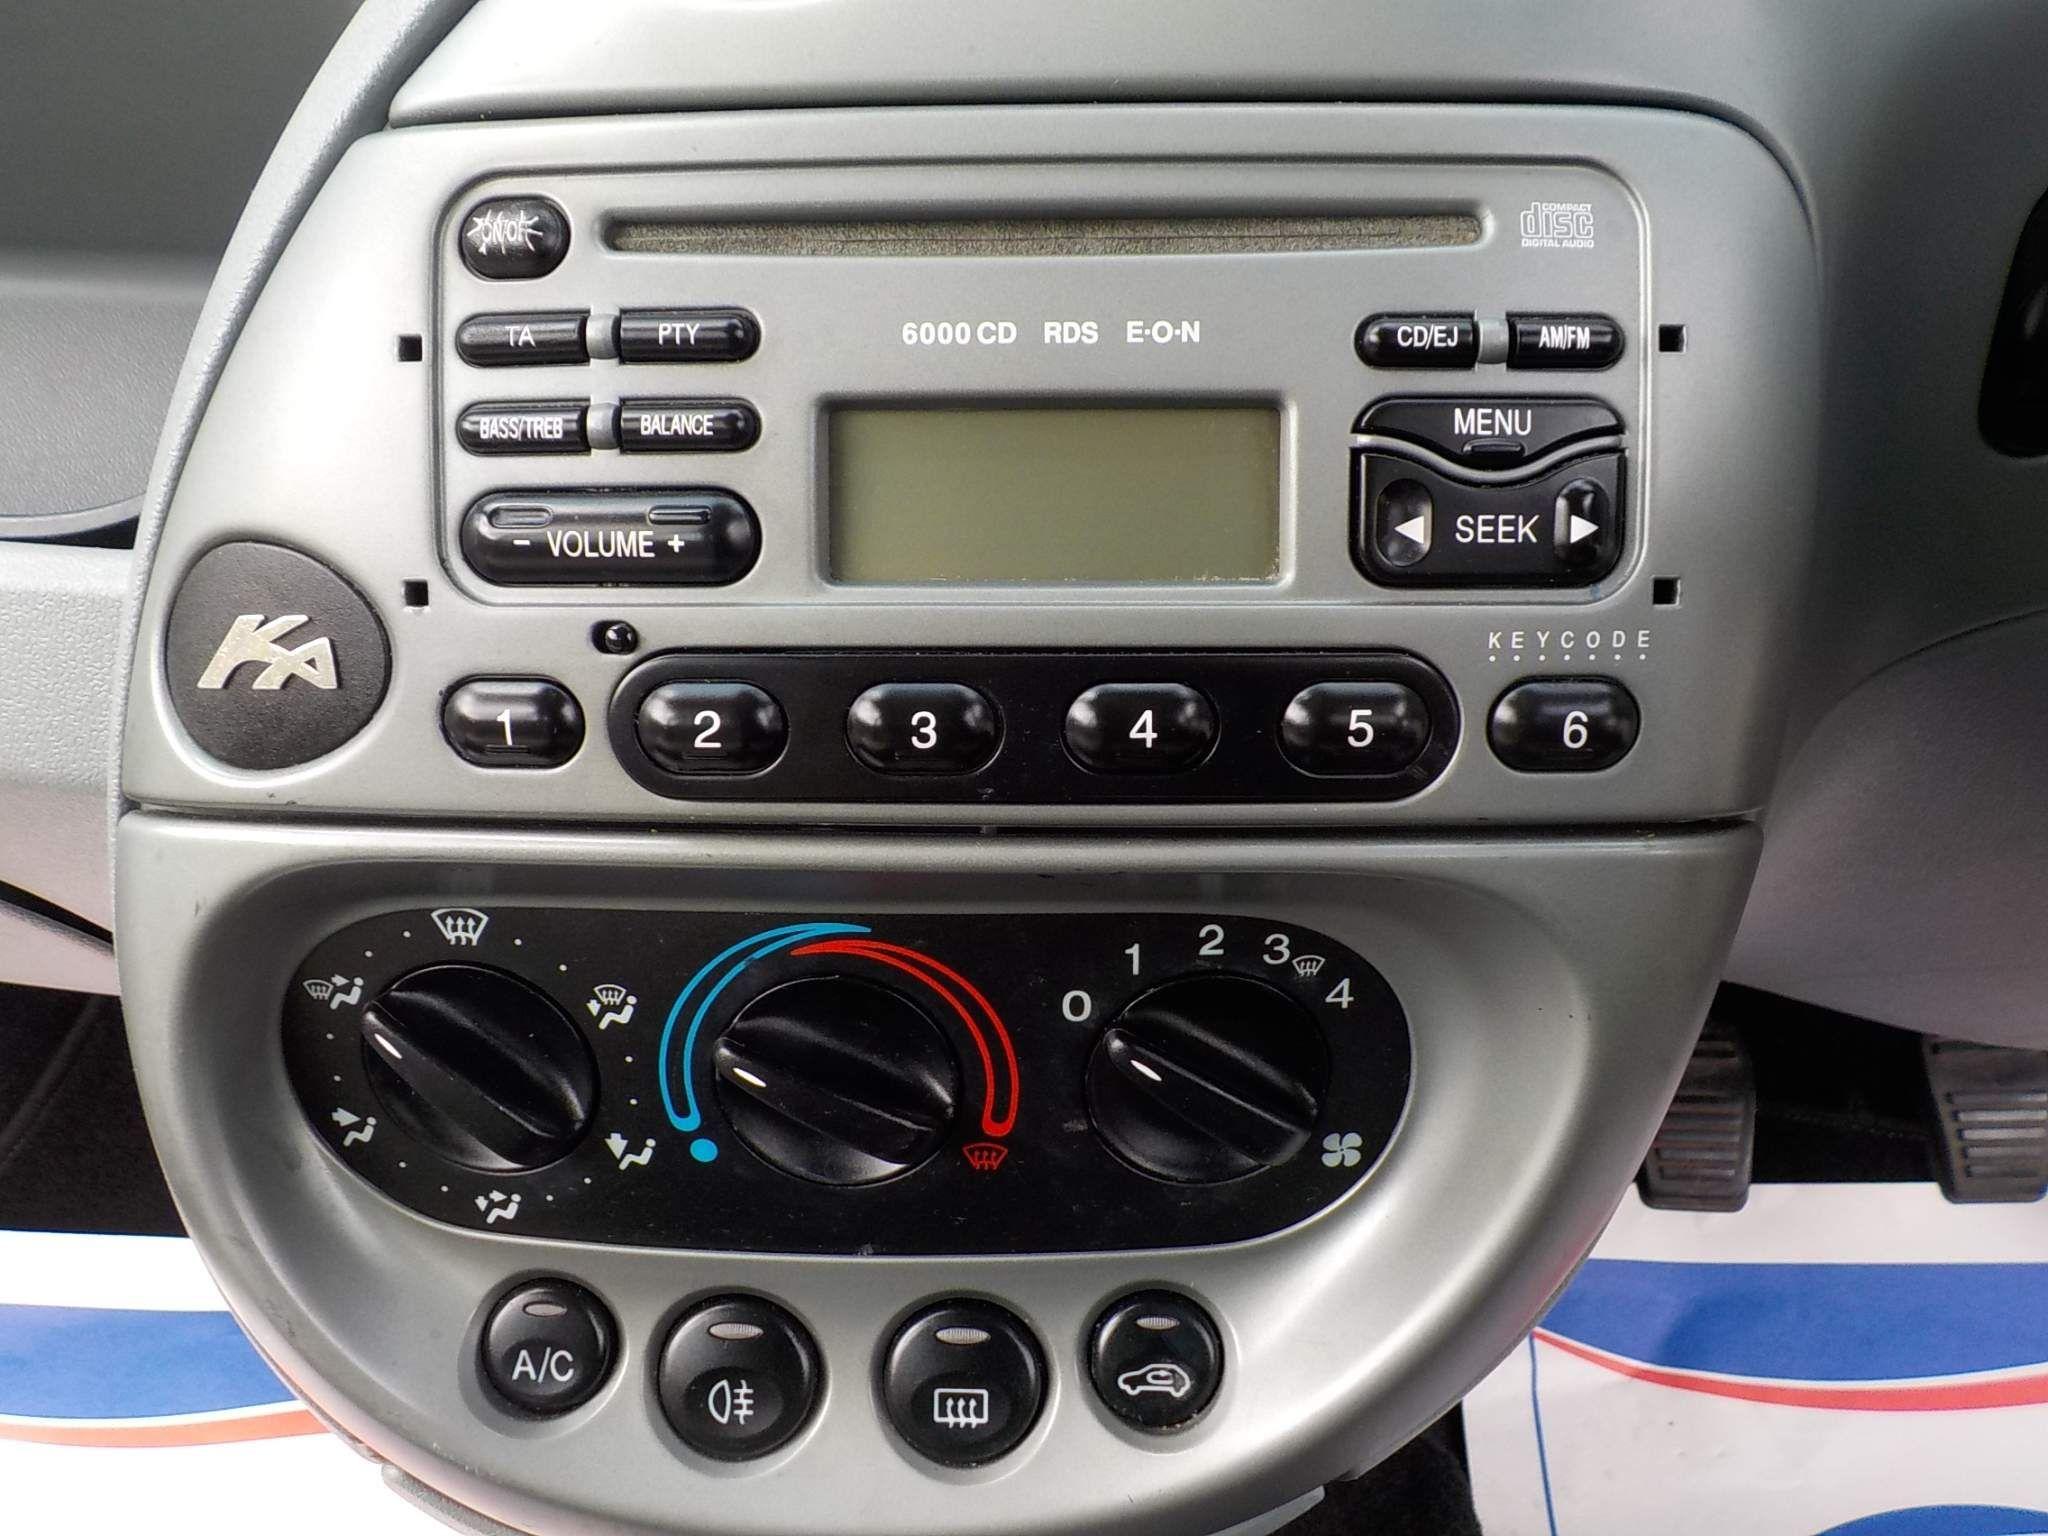 Ford Ka 1.3 Luxury 3dr